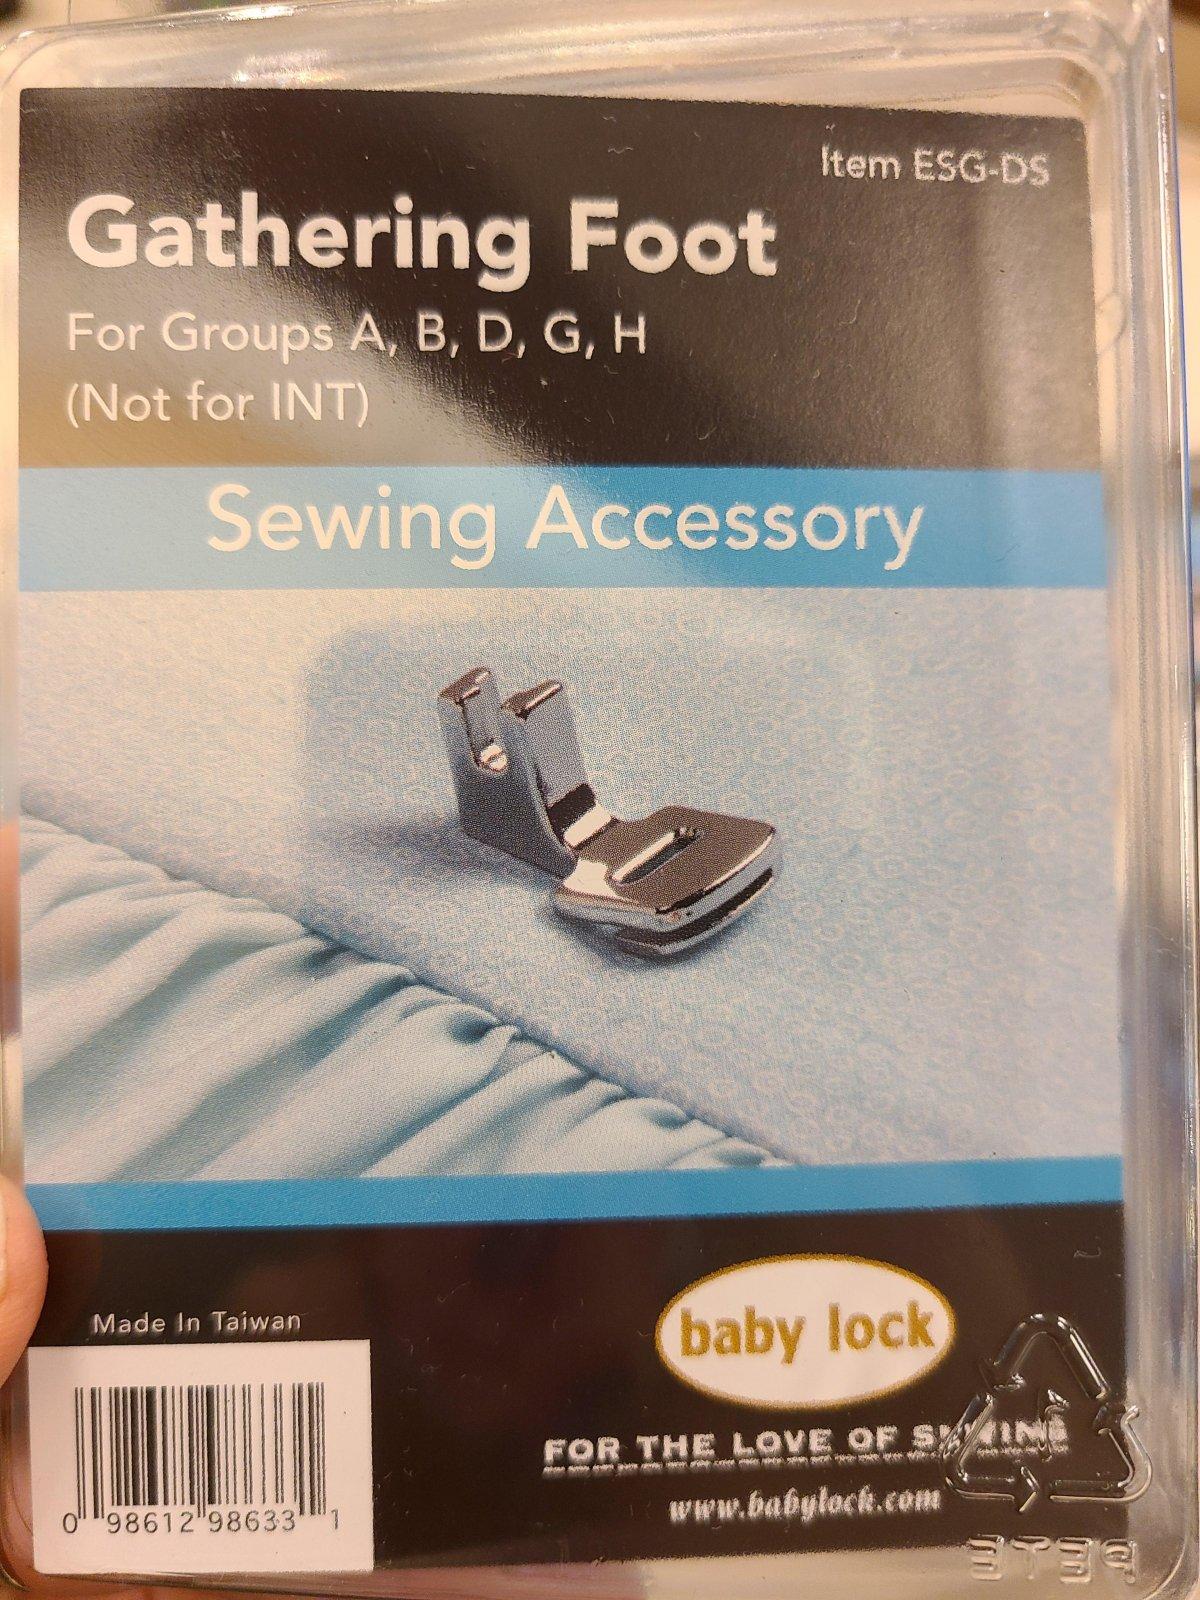 Baby Lock Gathering Foot